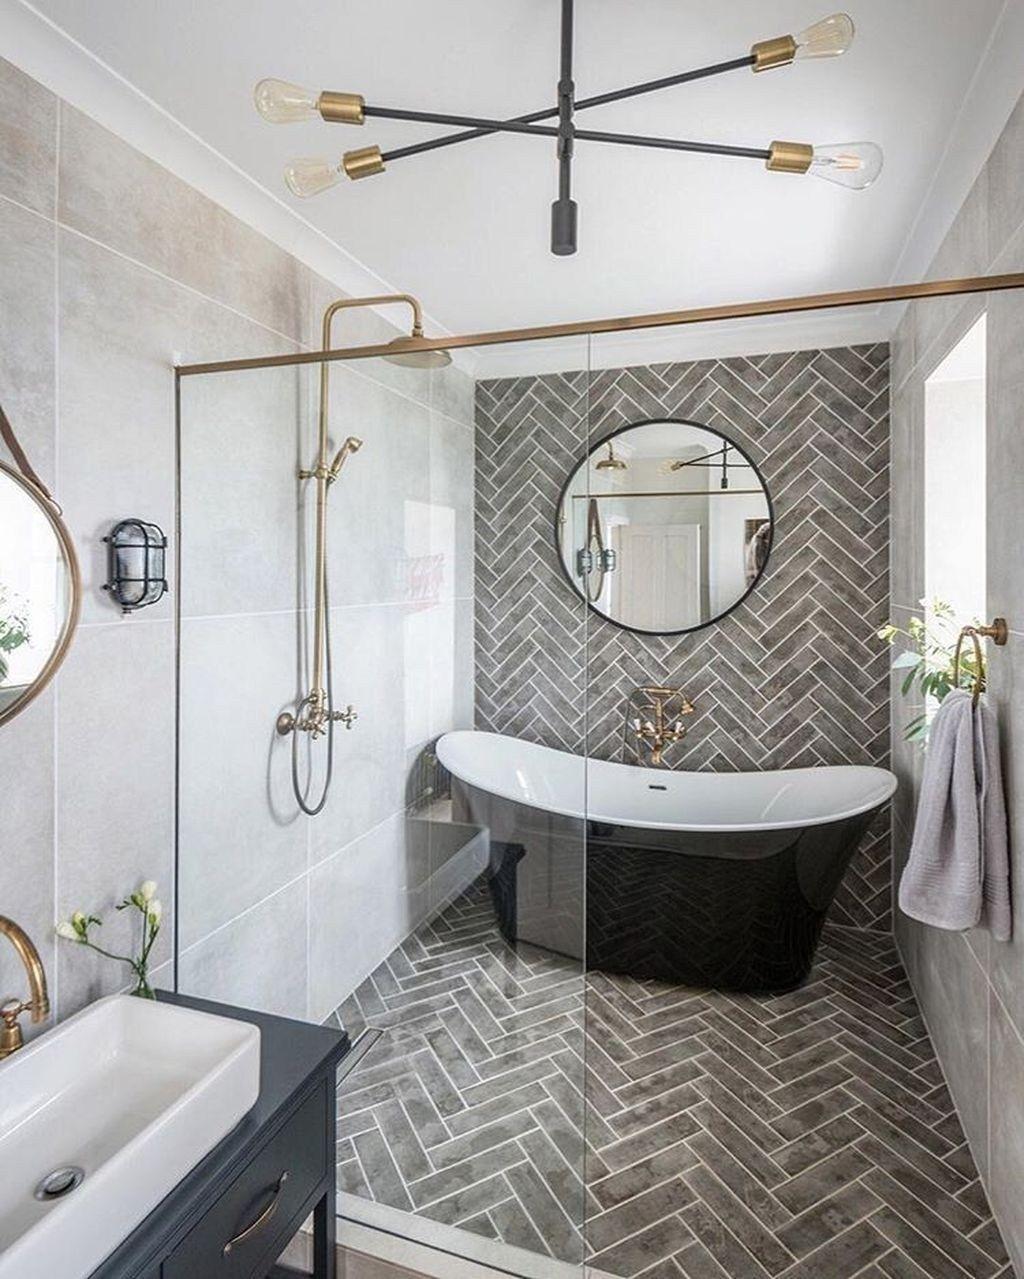 30 Best Master Bathroom Shower Remodel Ideas To Try Trendedecor Master Bathroom Design Master Bathroom Renovation Small Bathroom Remodel